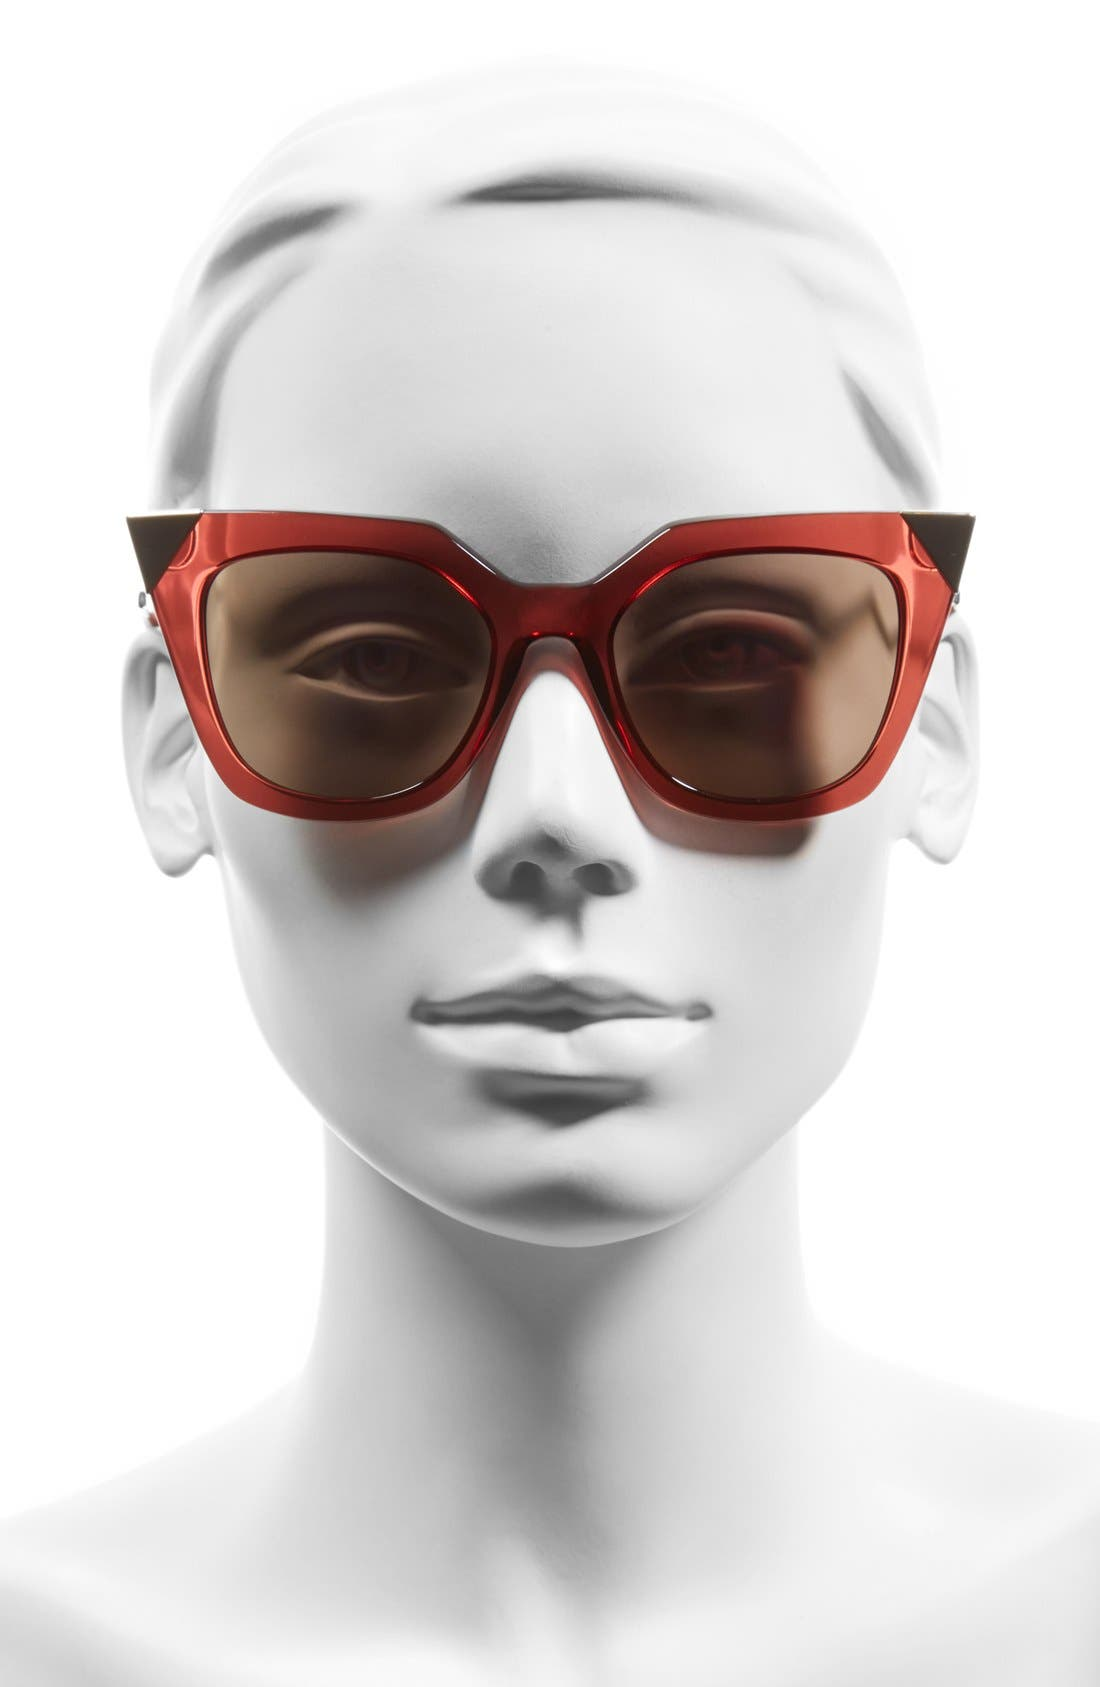 52mm Cat Eye Sunglasses,                             Alternate thumbnail 14, color,